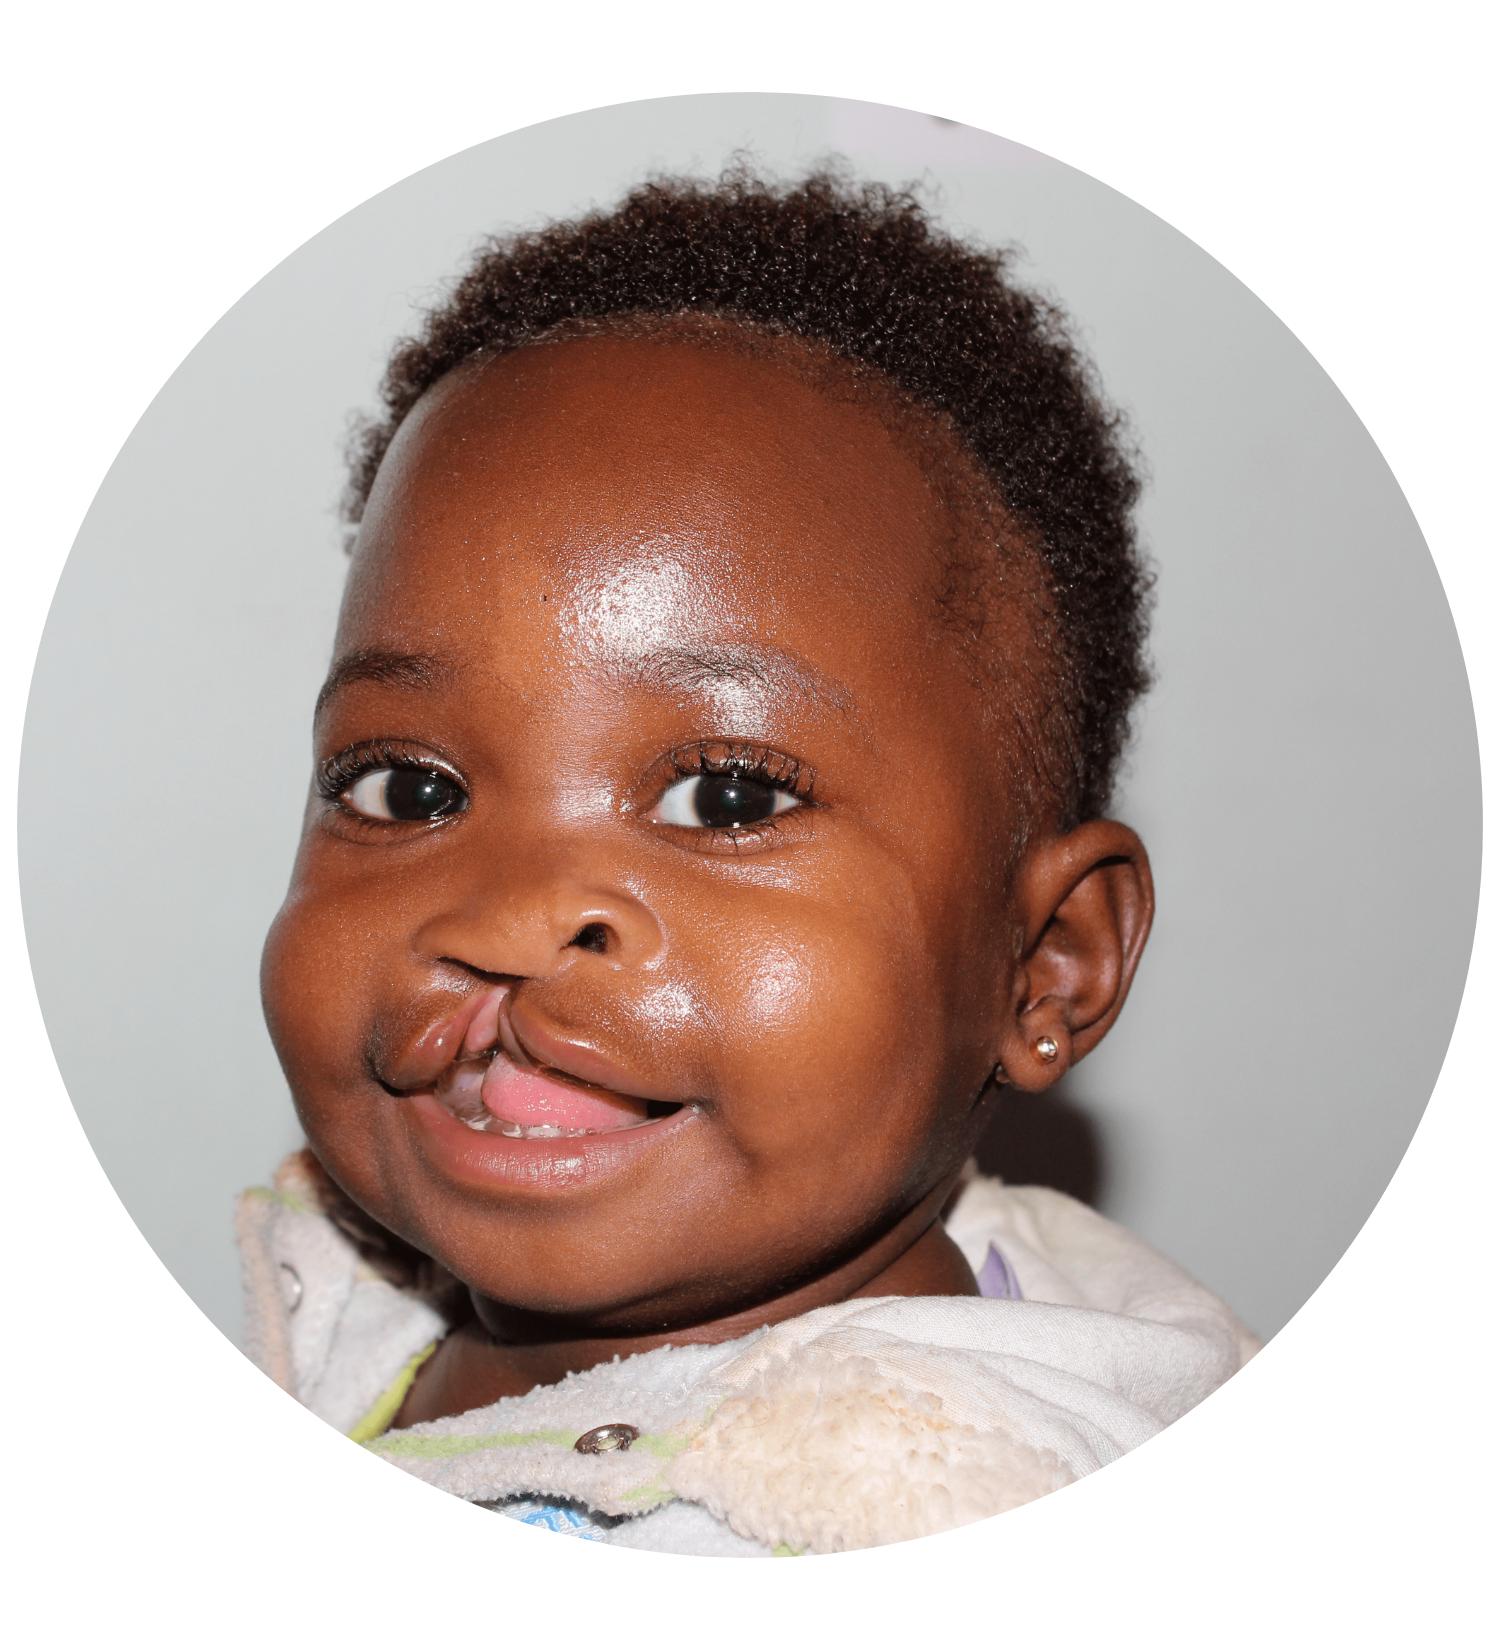 Uganda: Meet Prossy